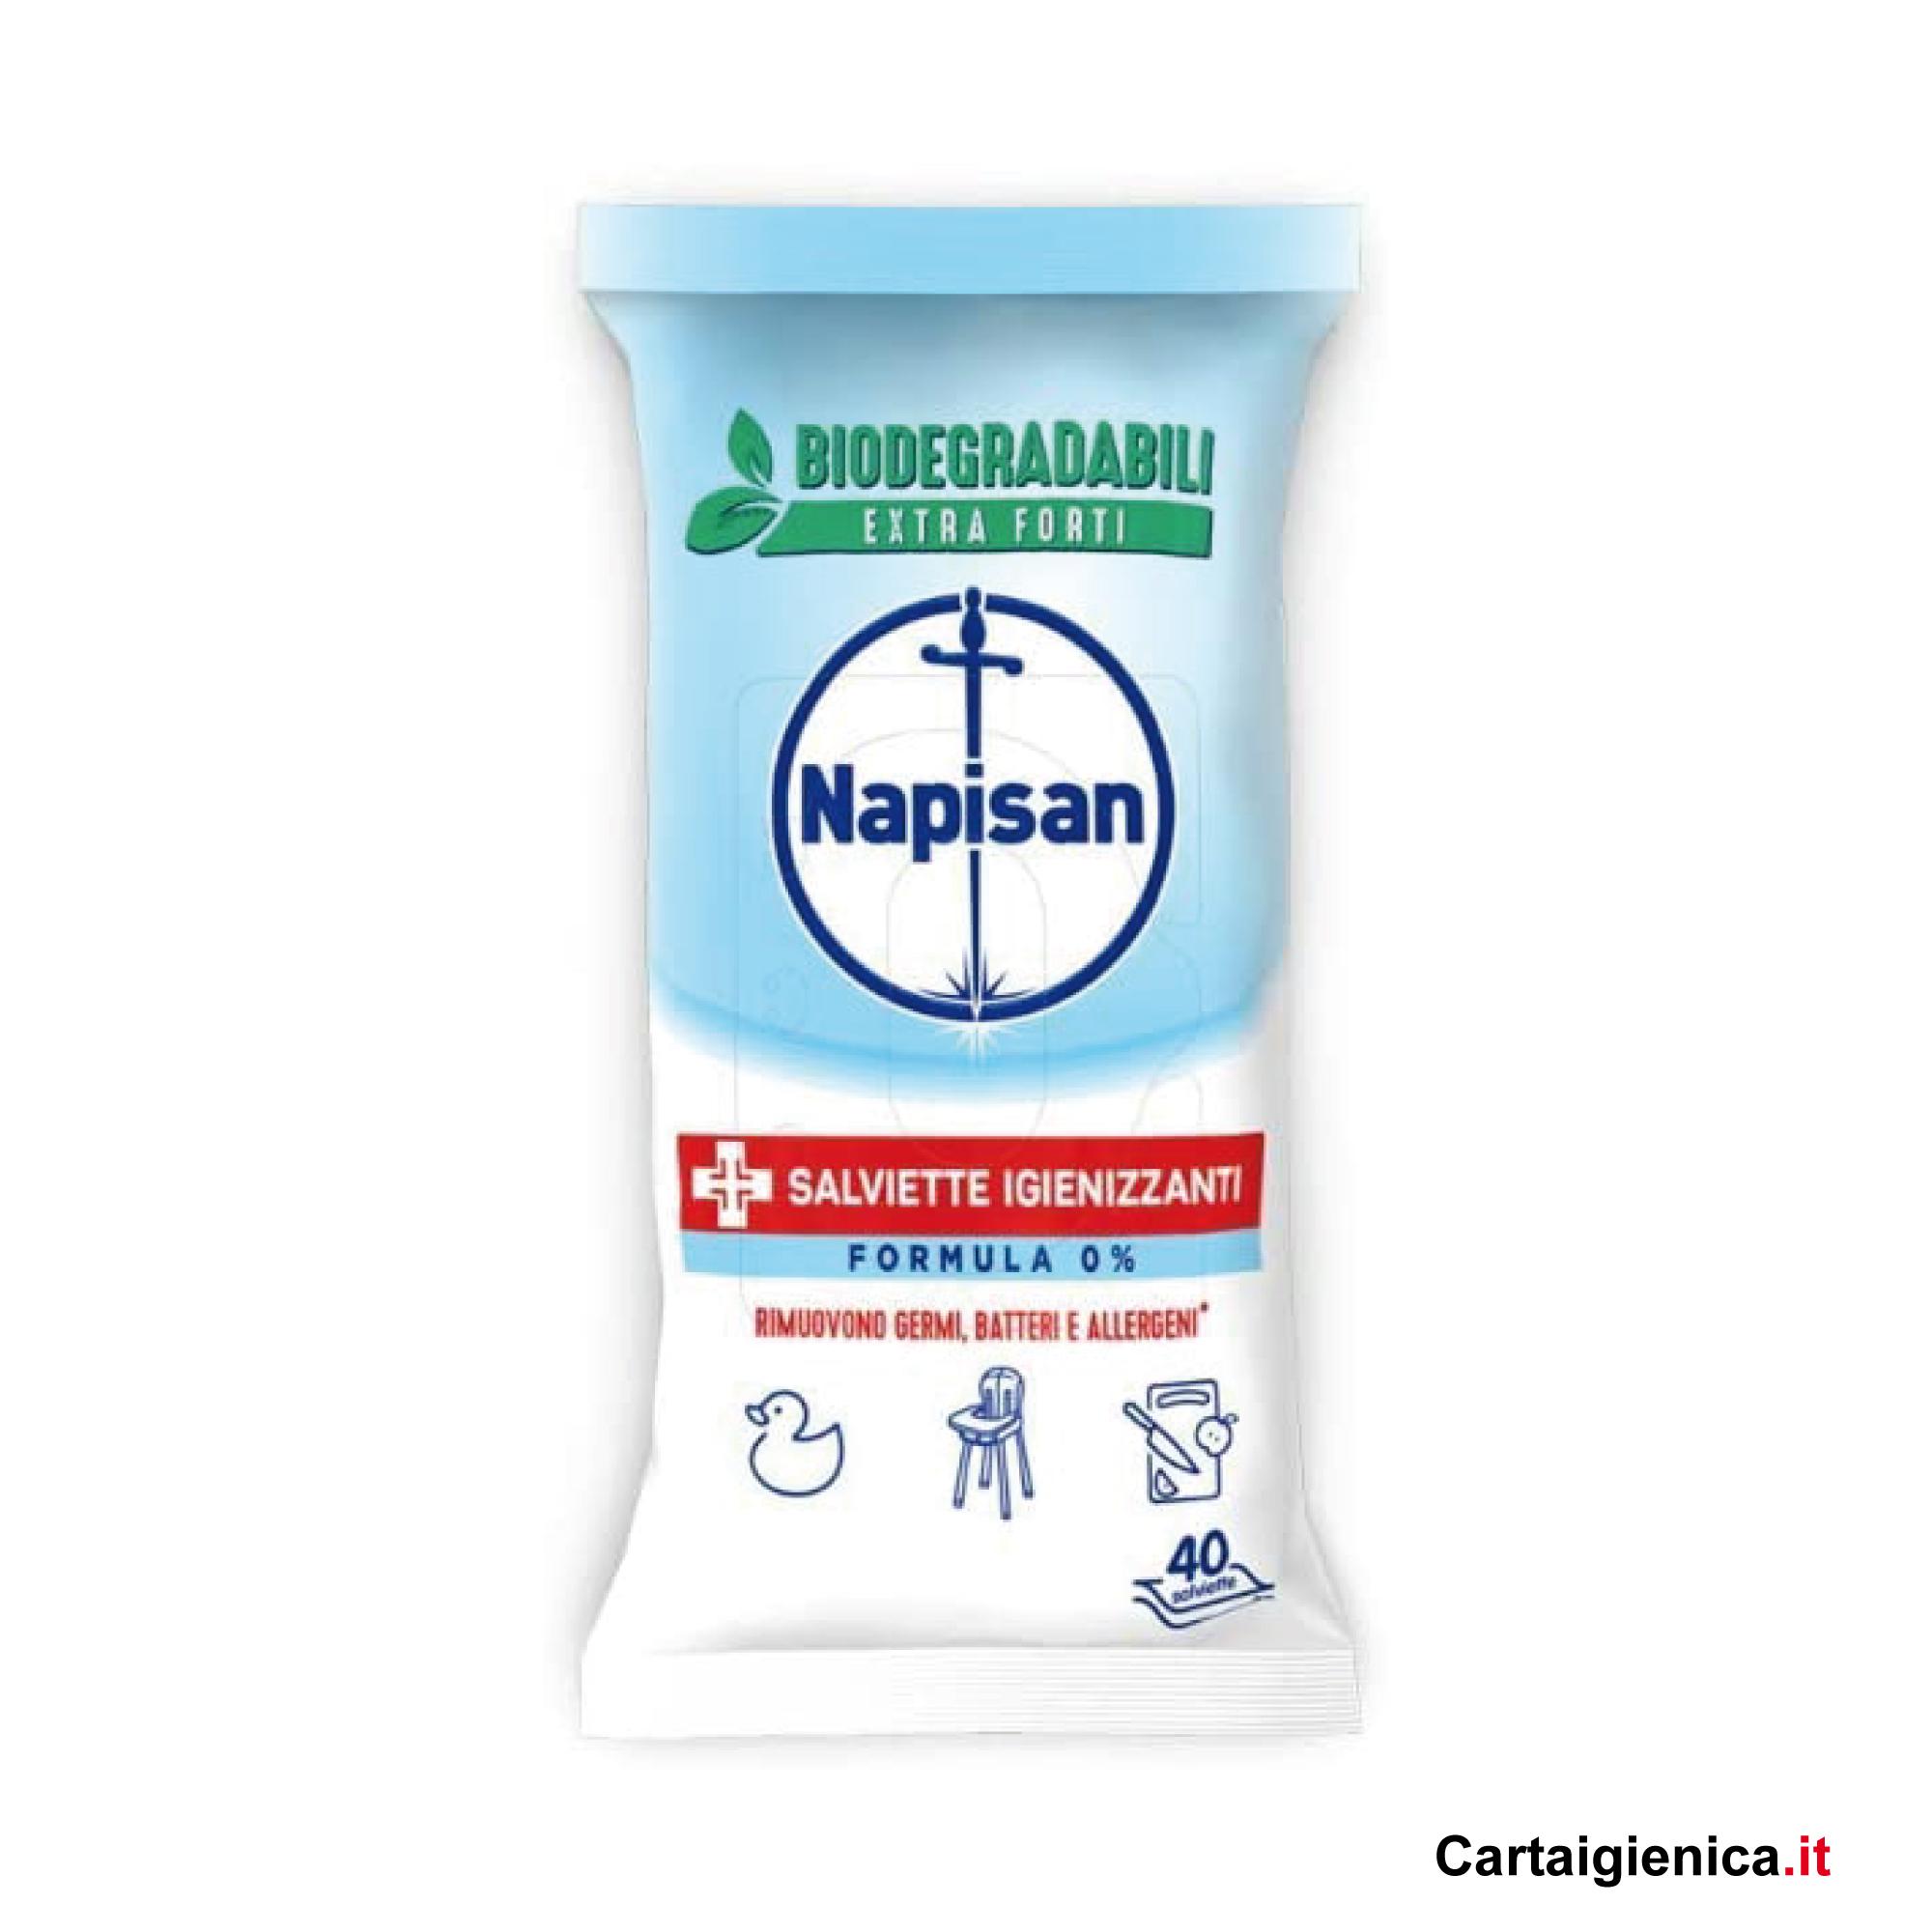 napisan salviette igienizzanti formula 0 rimuovono germi batteri allergeni